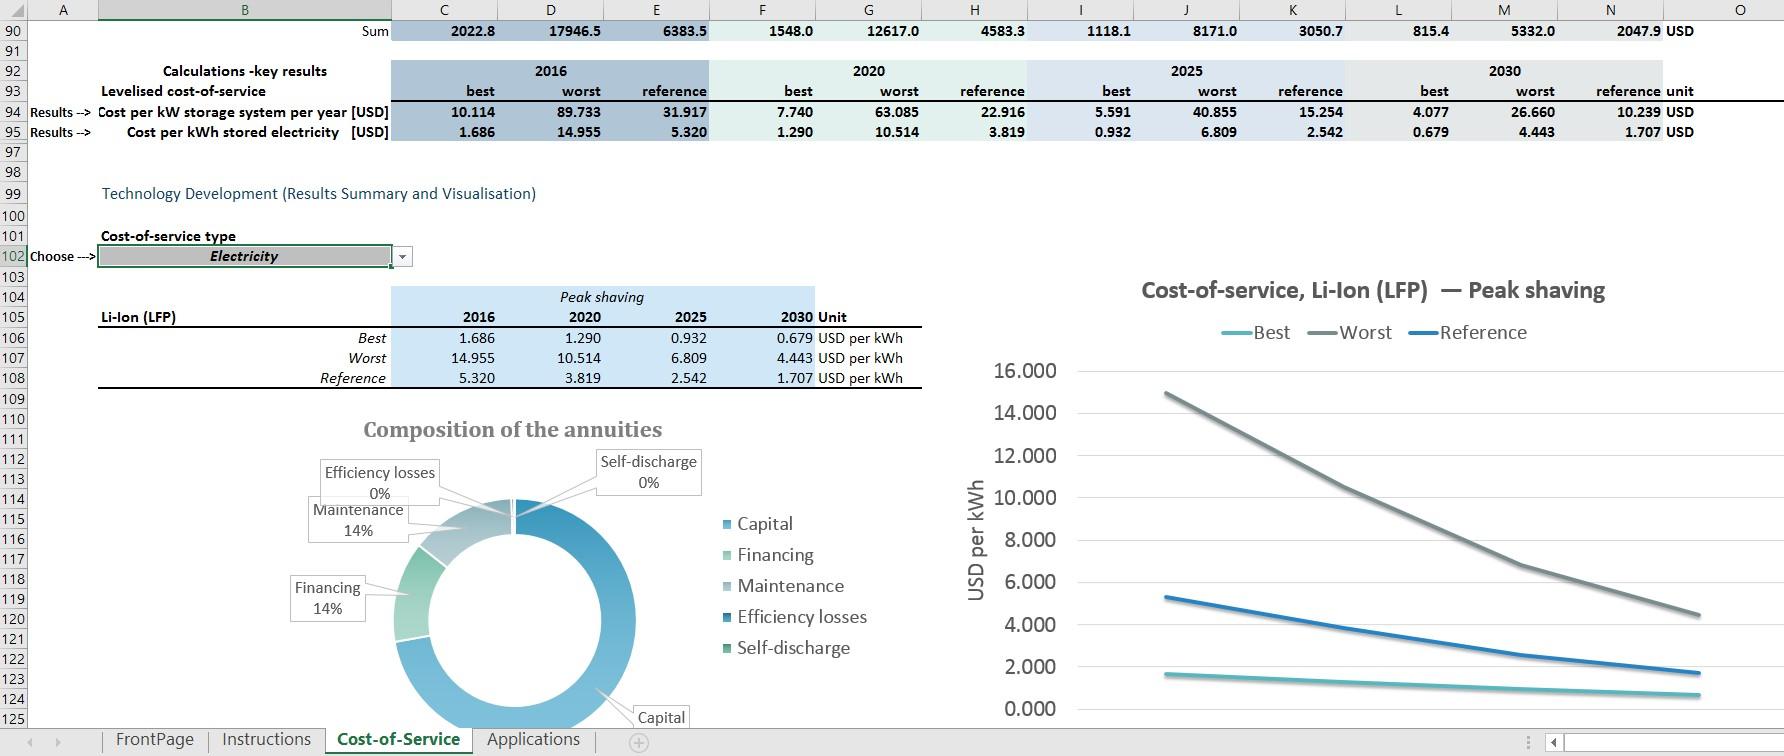 New IRENA Tool to Help Estimate Storage Costs